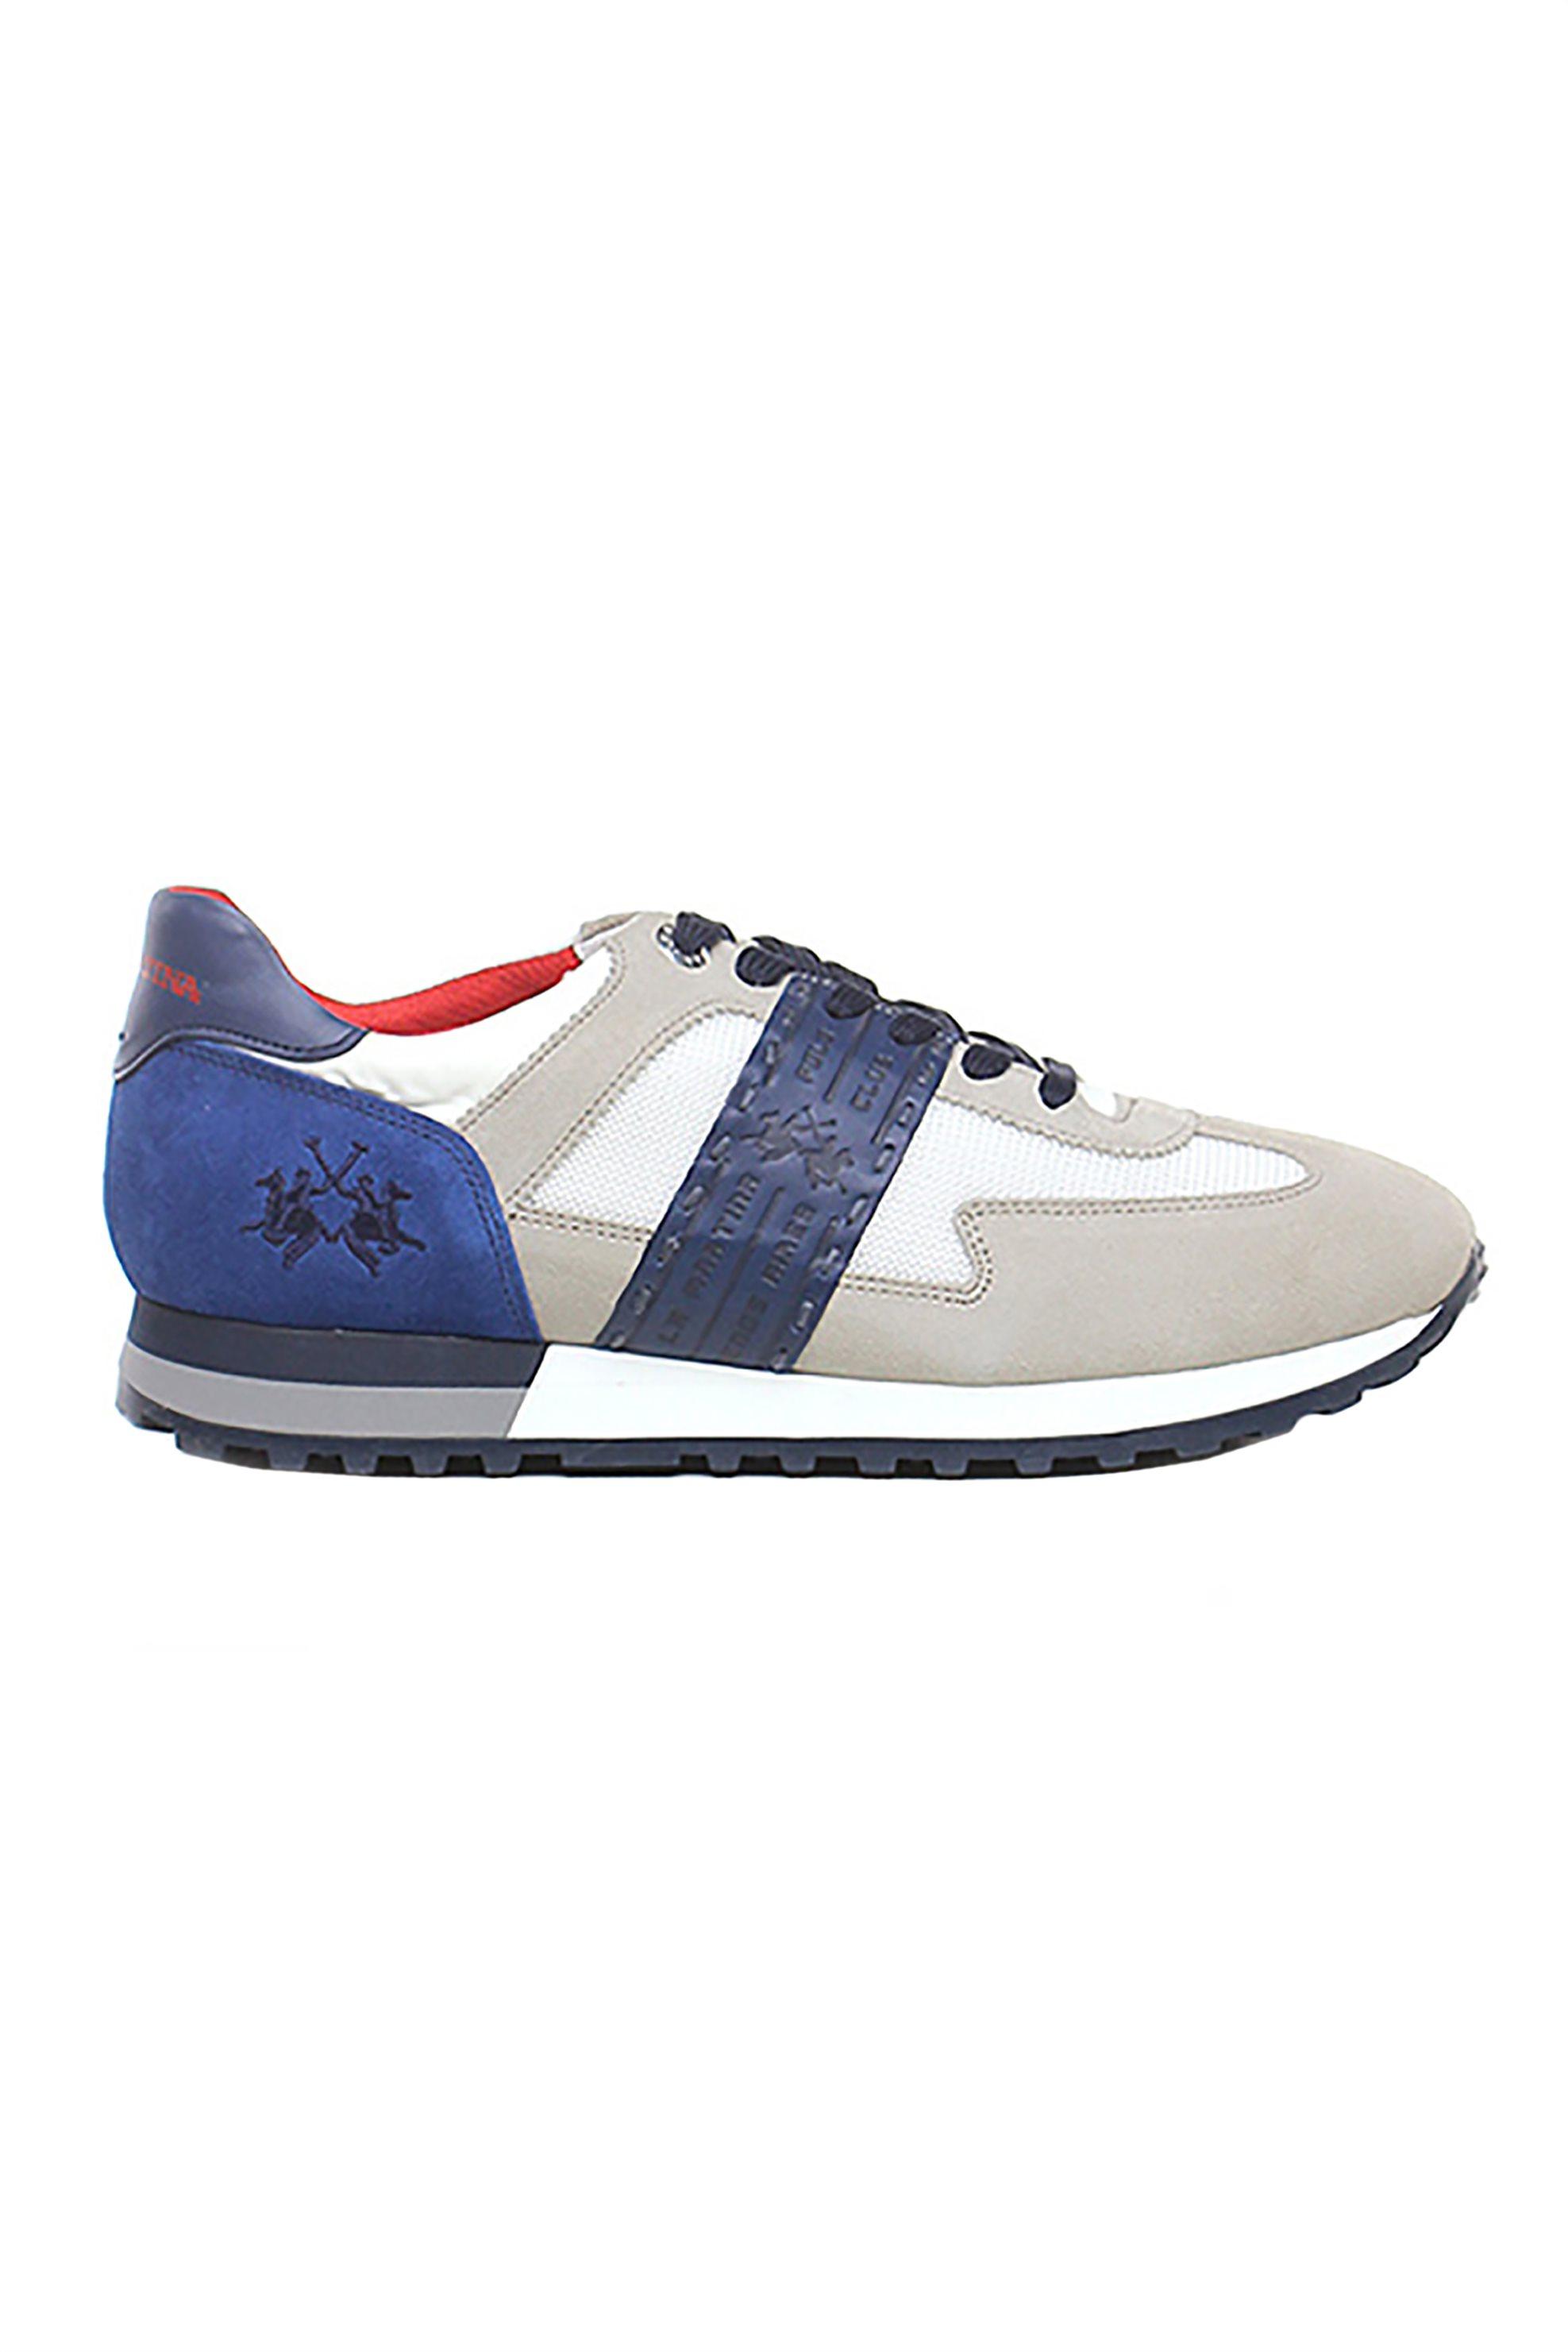 La Martina ανδρικά sneakers με κορδόνια – LFM201023-2300 – Πολύχρωμο